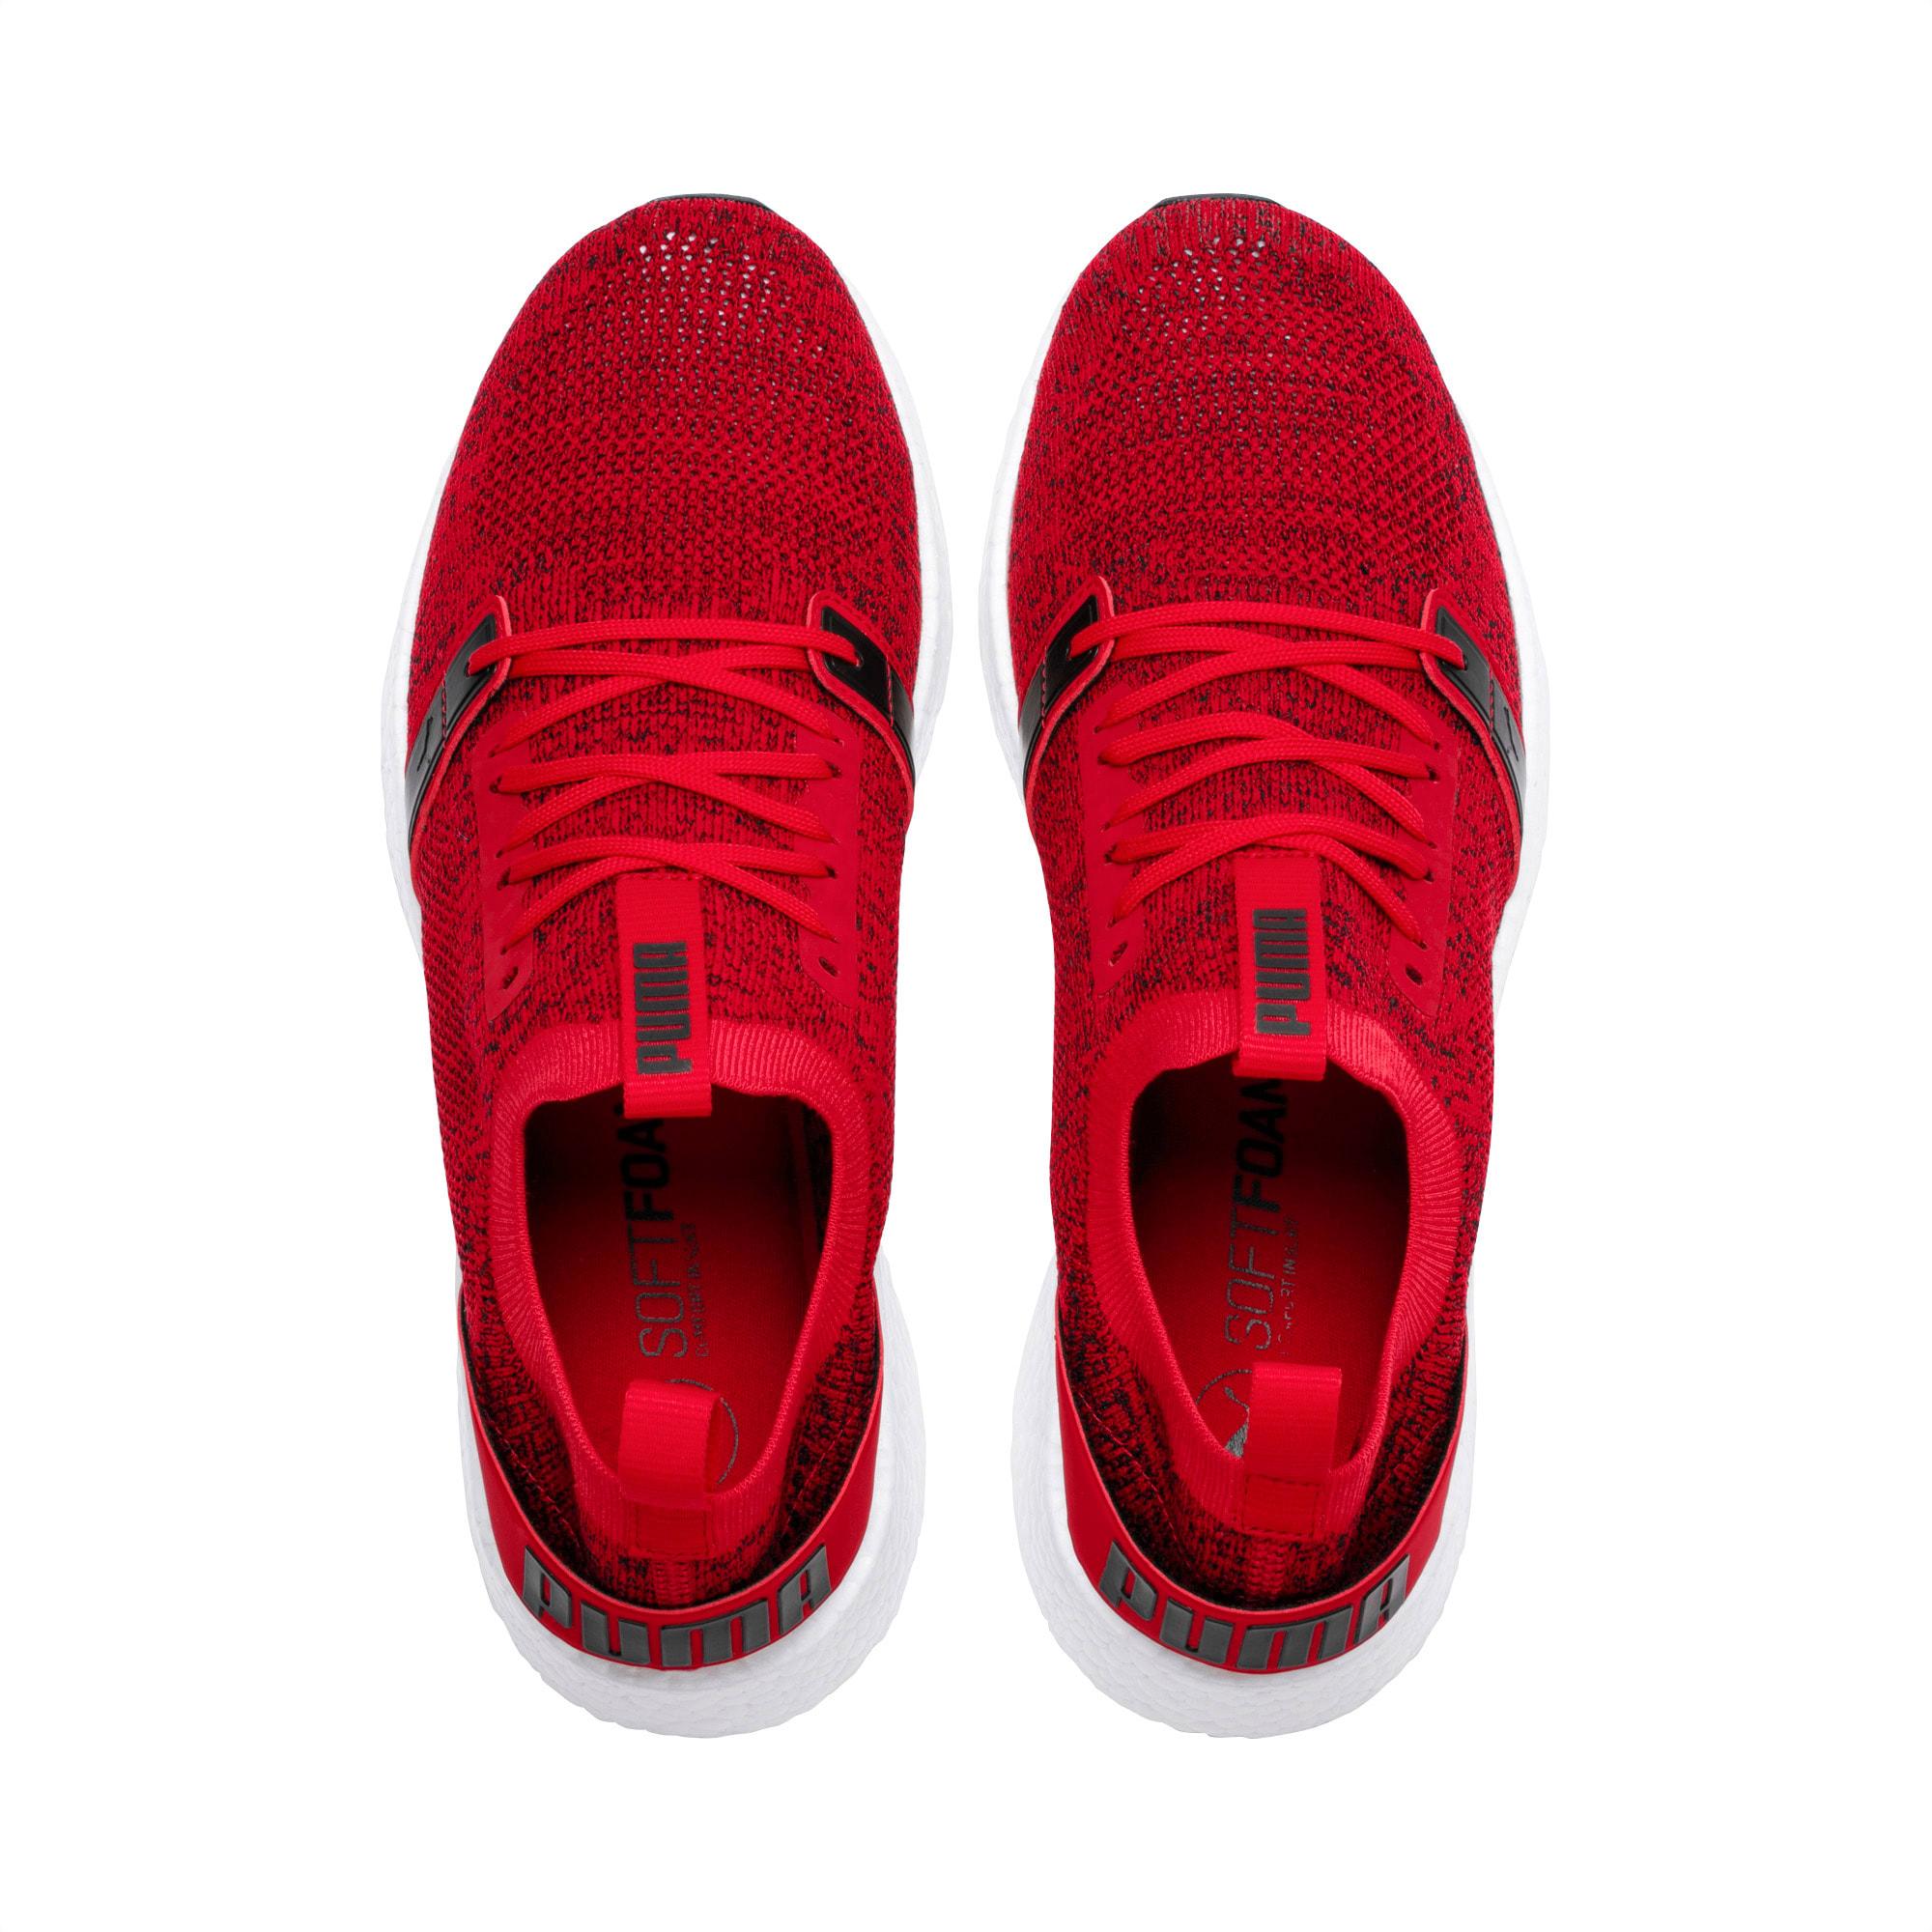 NRGY Neko Engineer Knit Men's Running Shoes